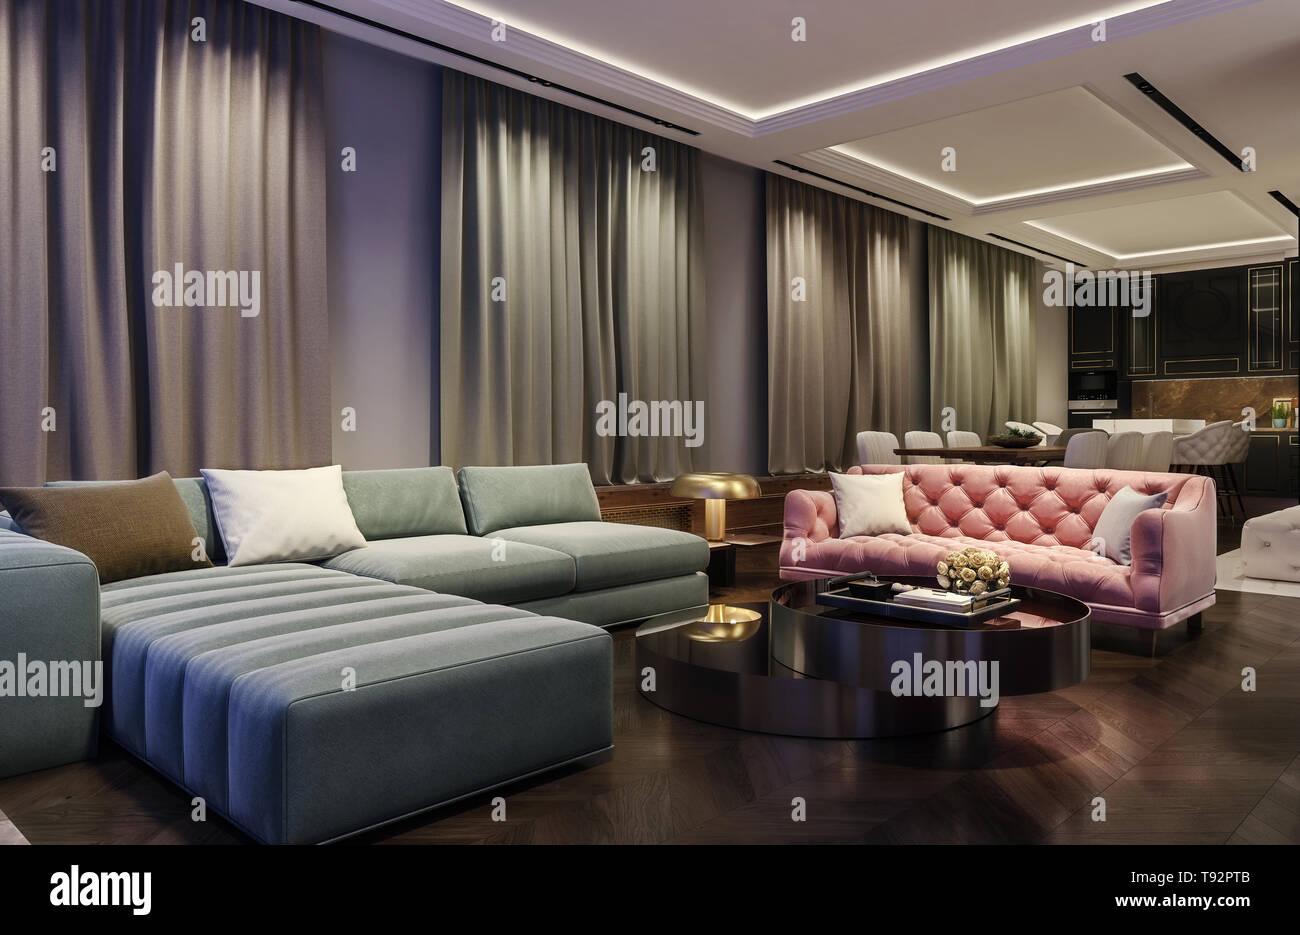 Modern Interior Design Of Living Room Night Scene With